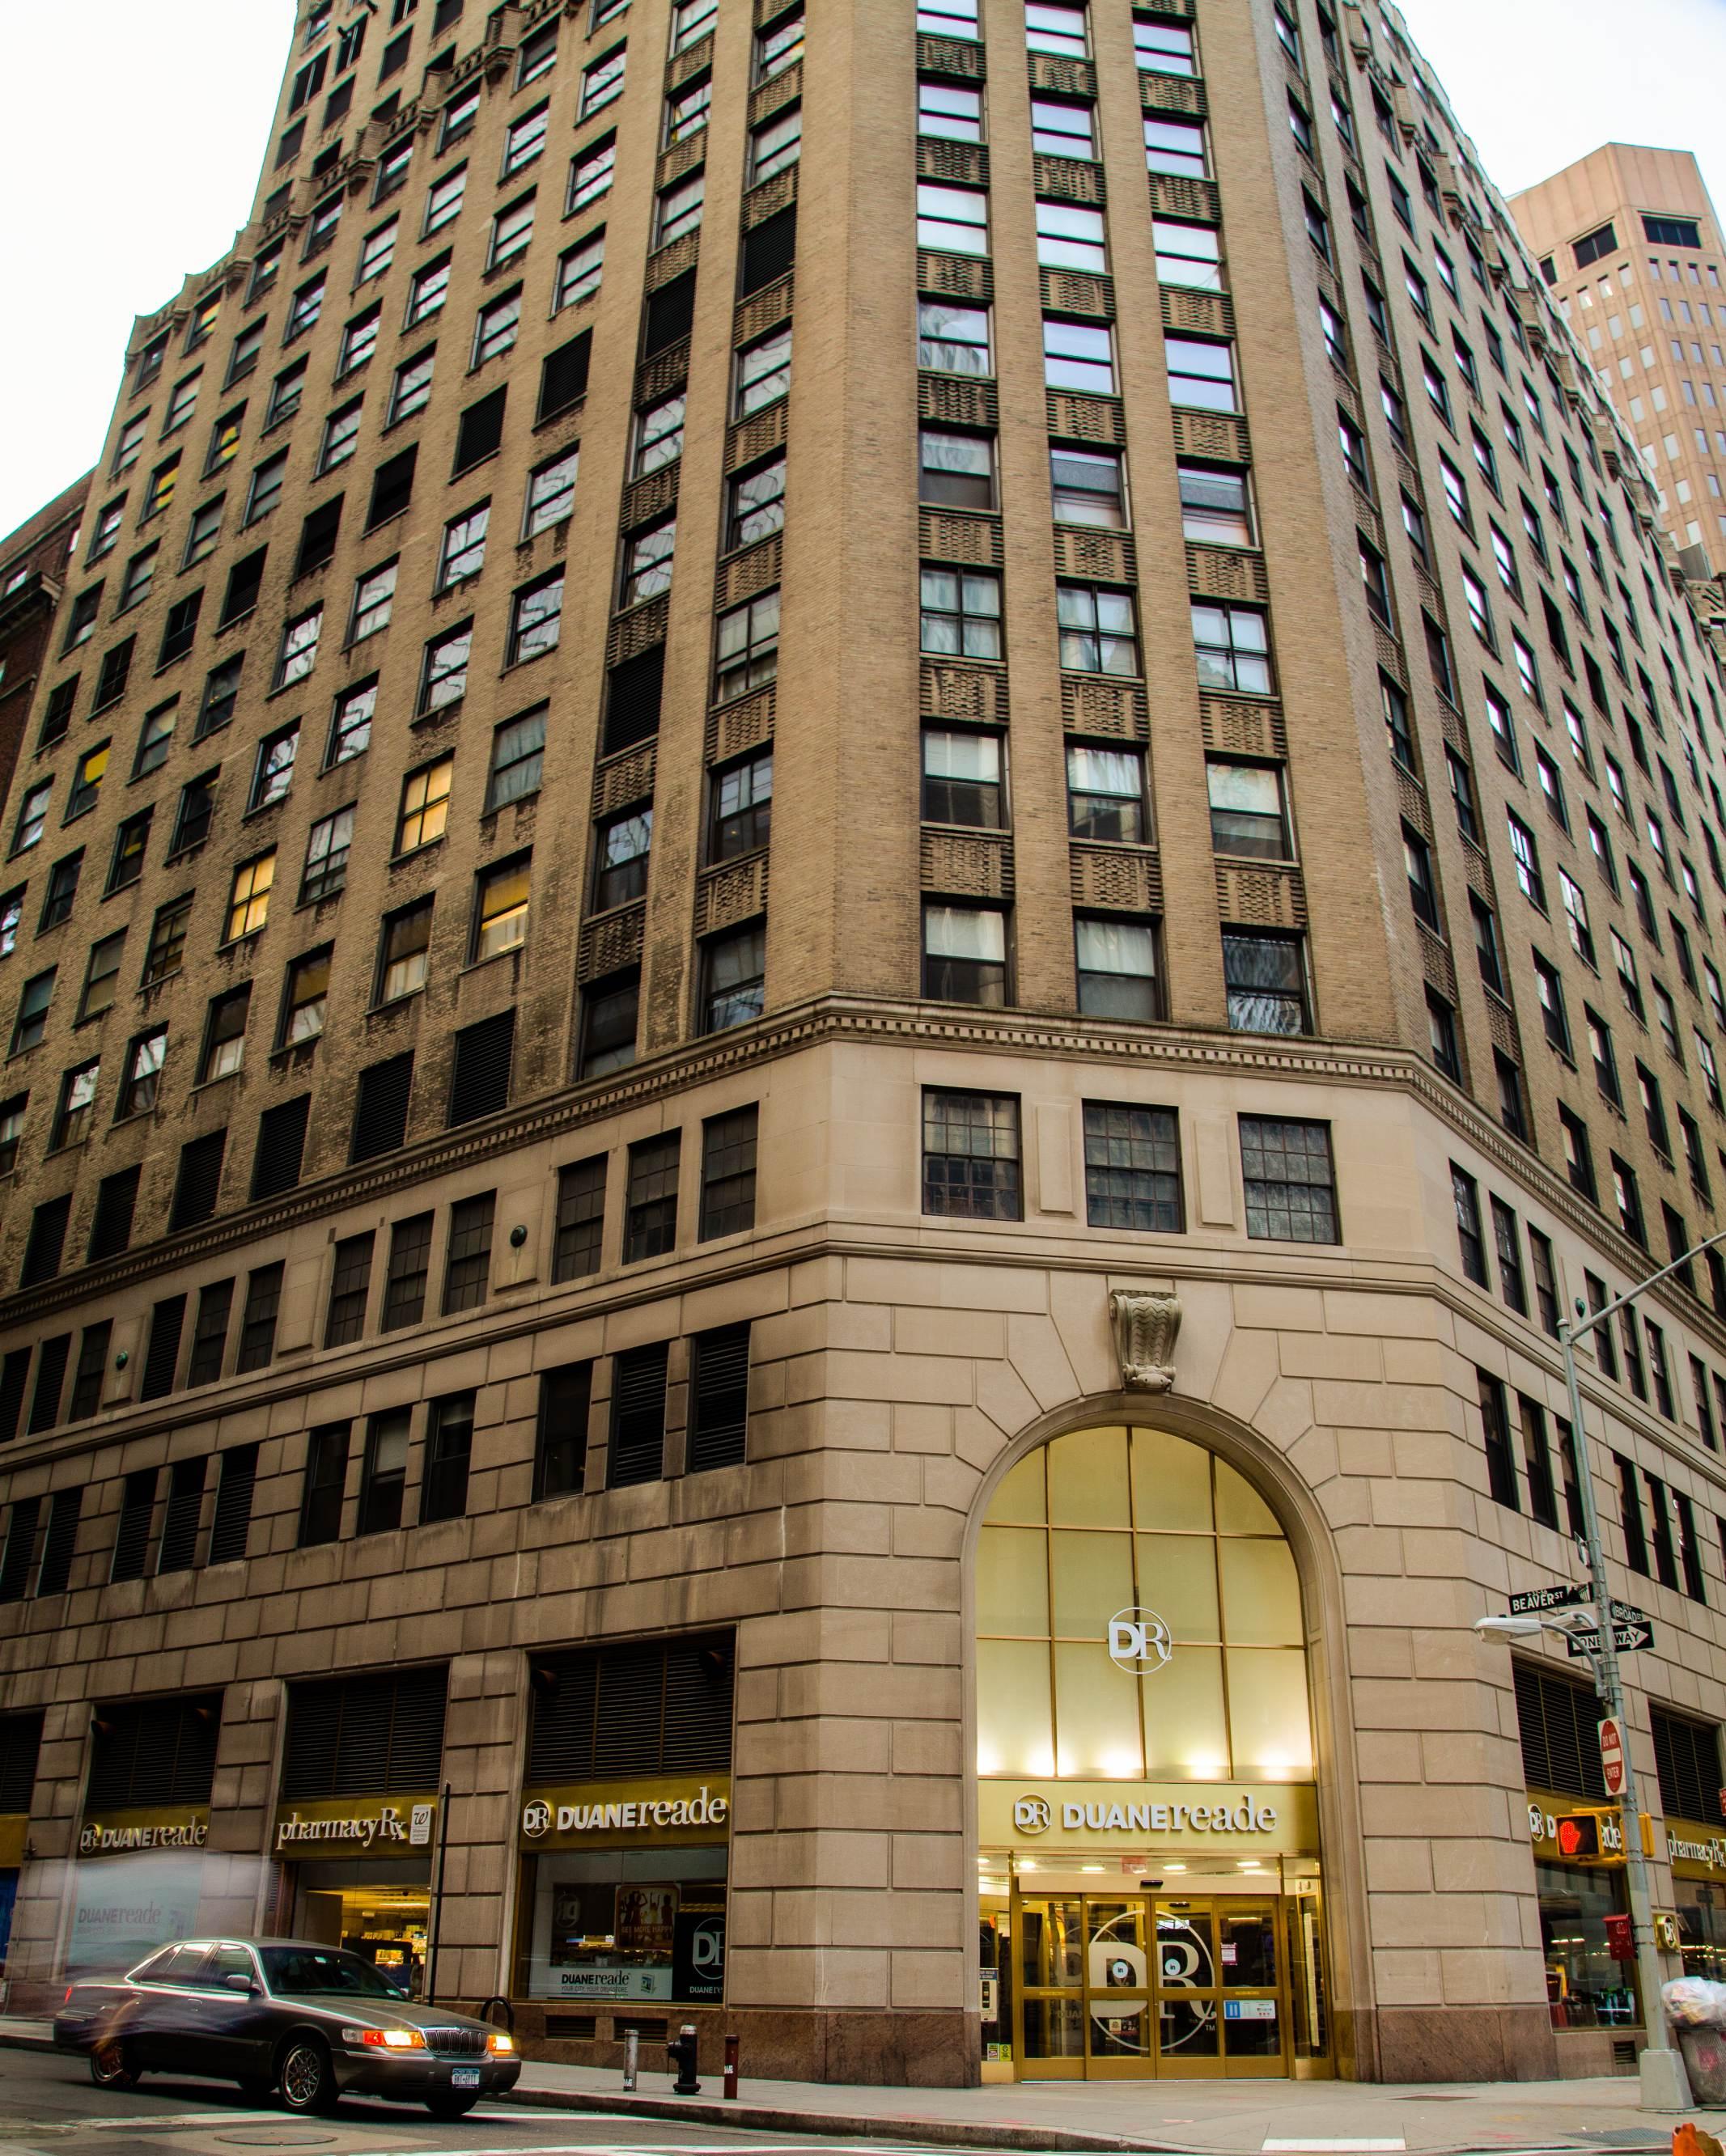 75 Broad St., New York